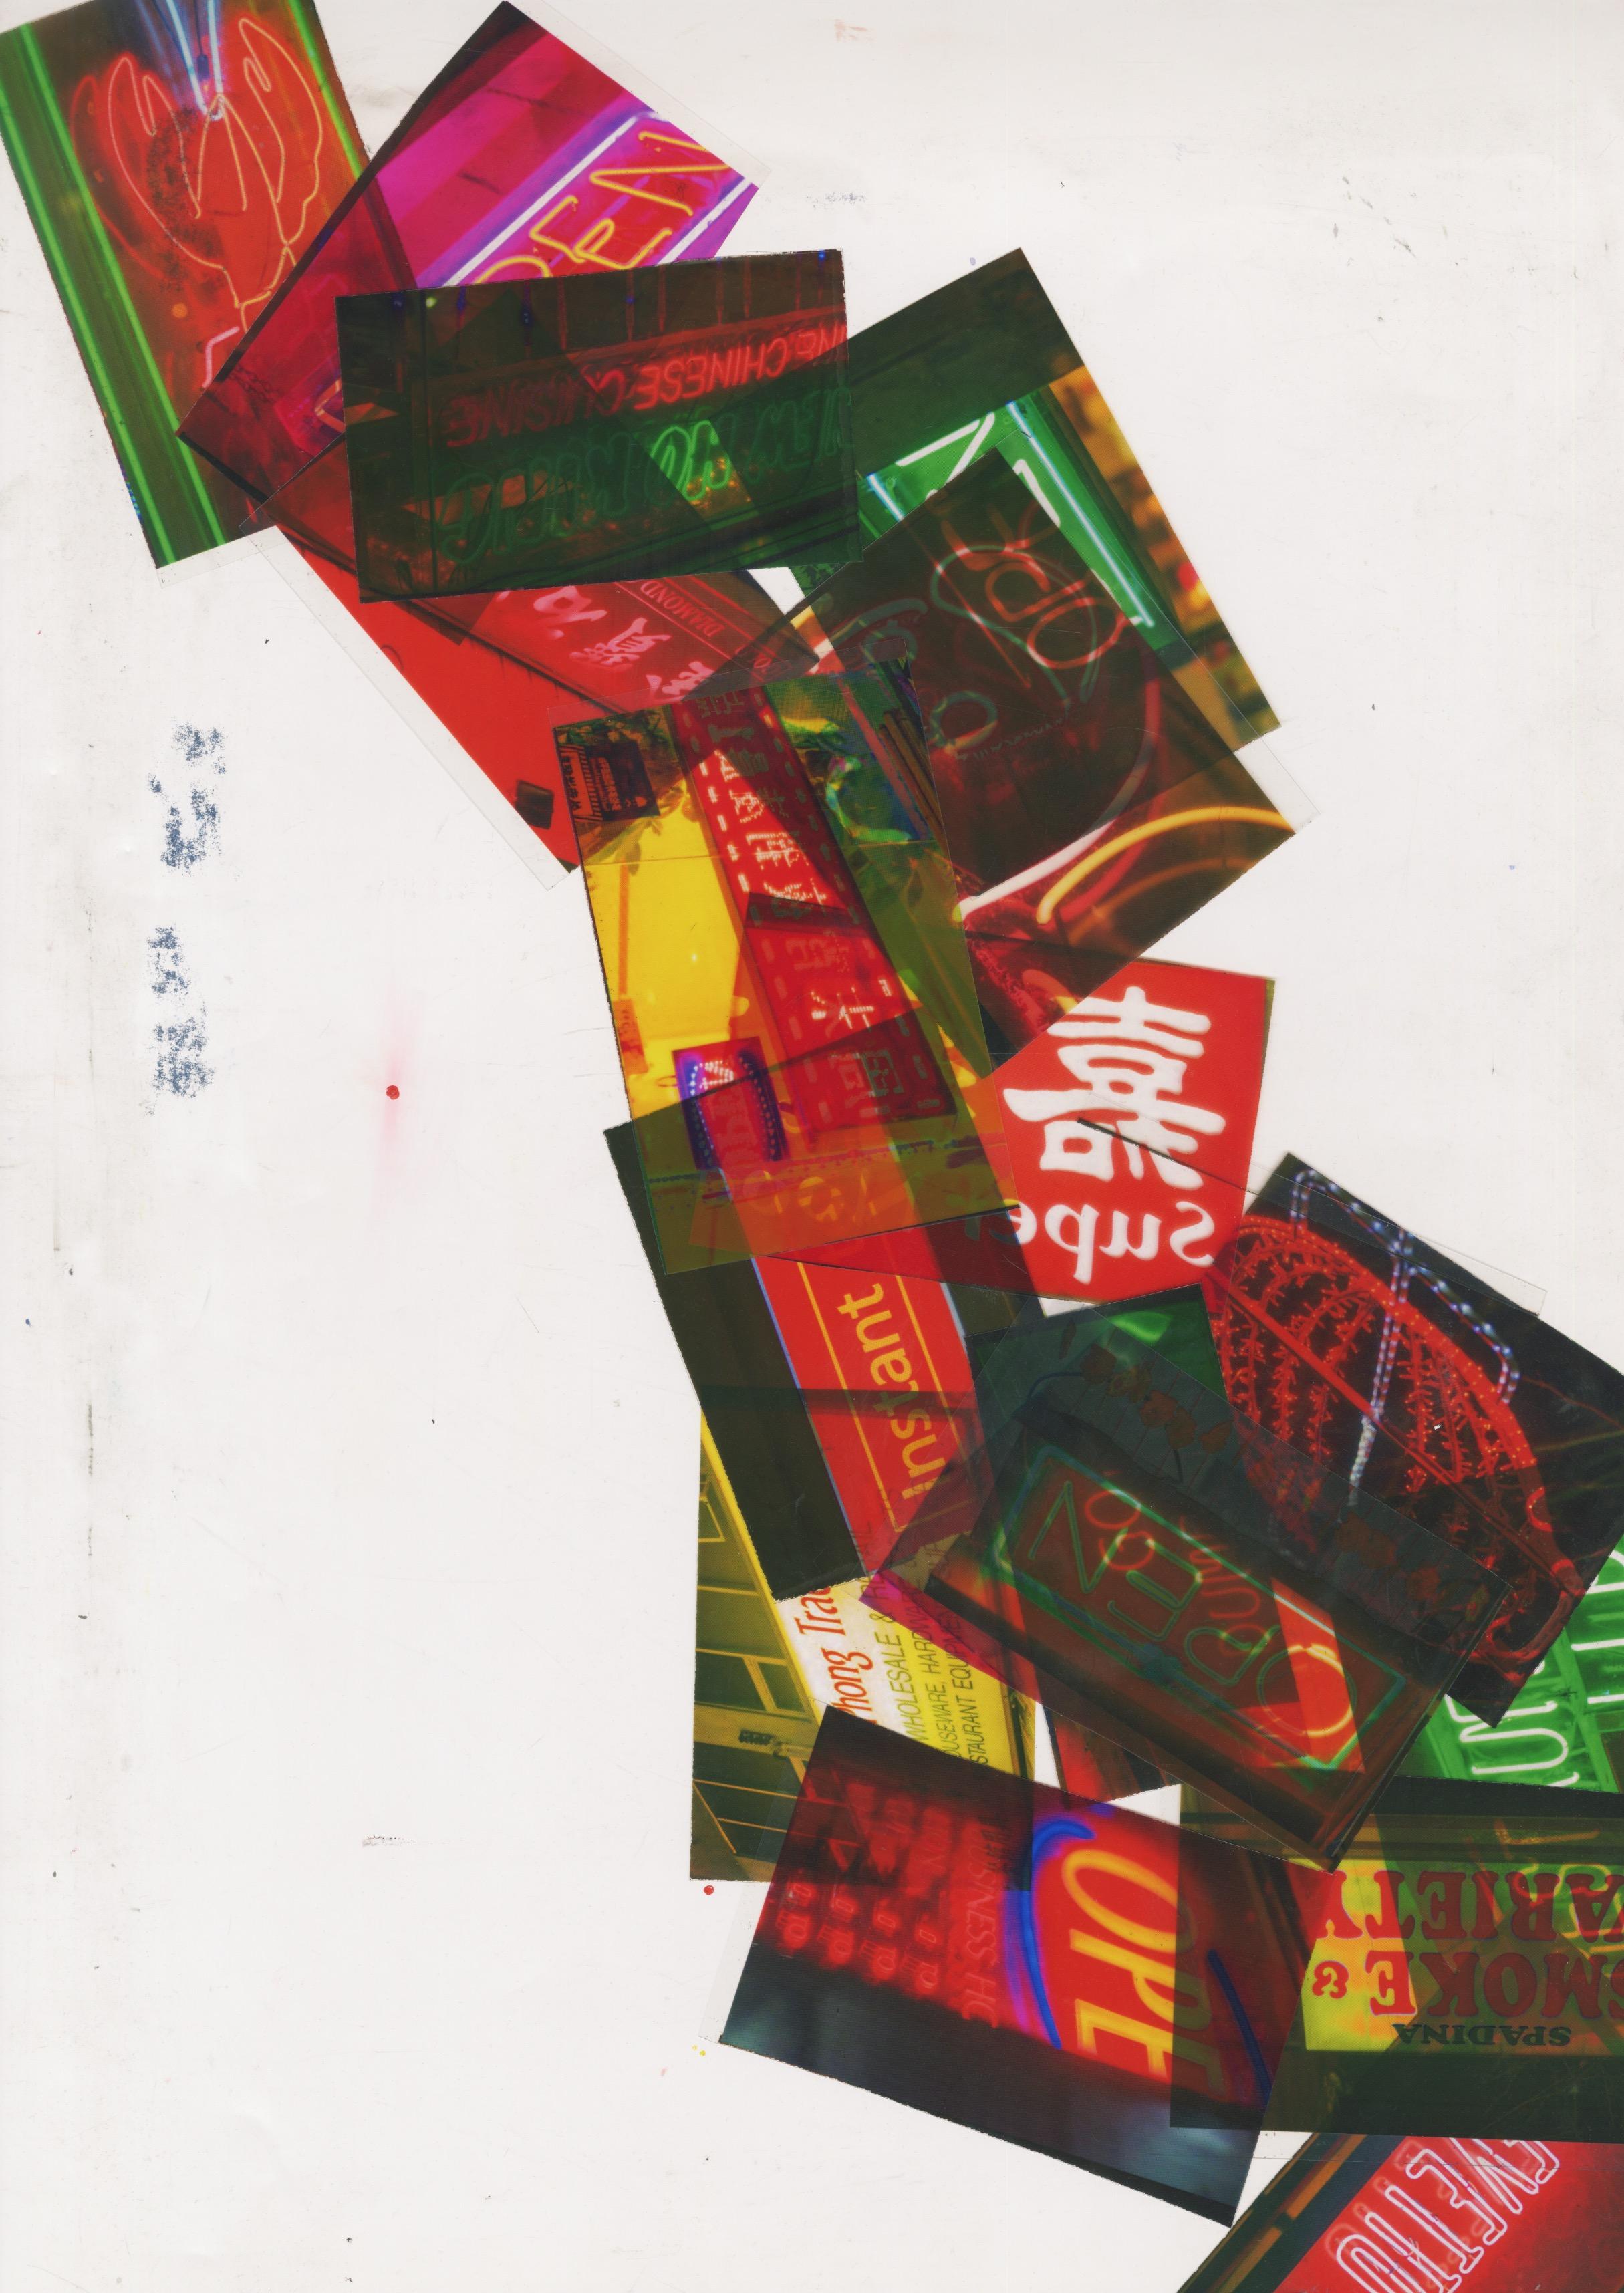 Jan 23rd chinatown scans 1.jpeg